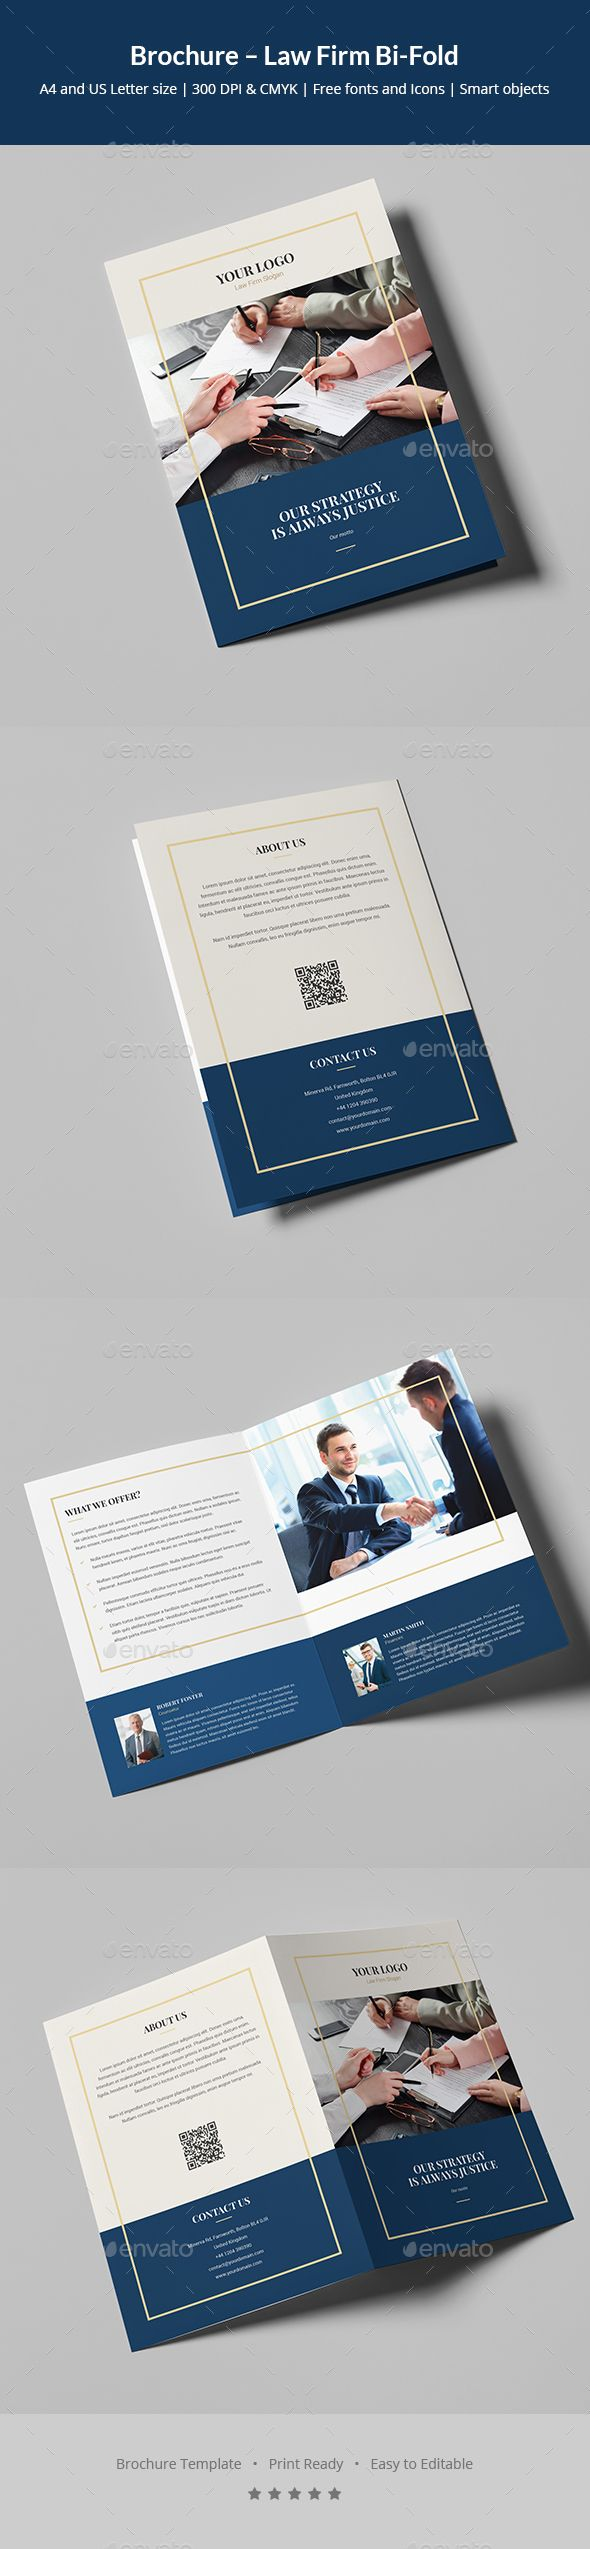 Brochure u2013 Law Firm Bi Fold 3546 best